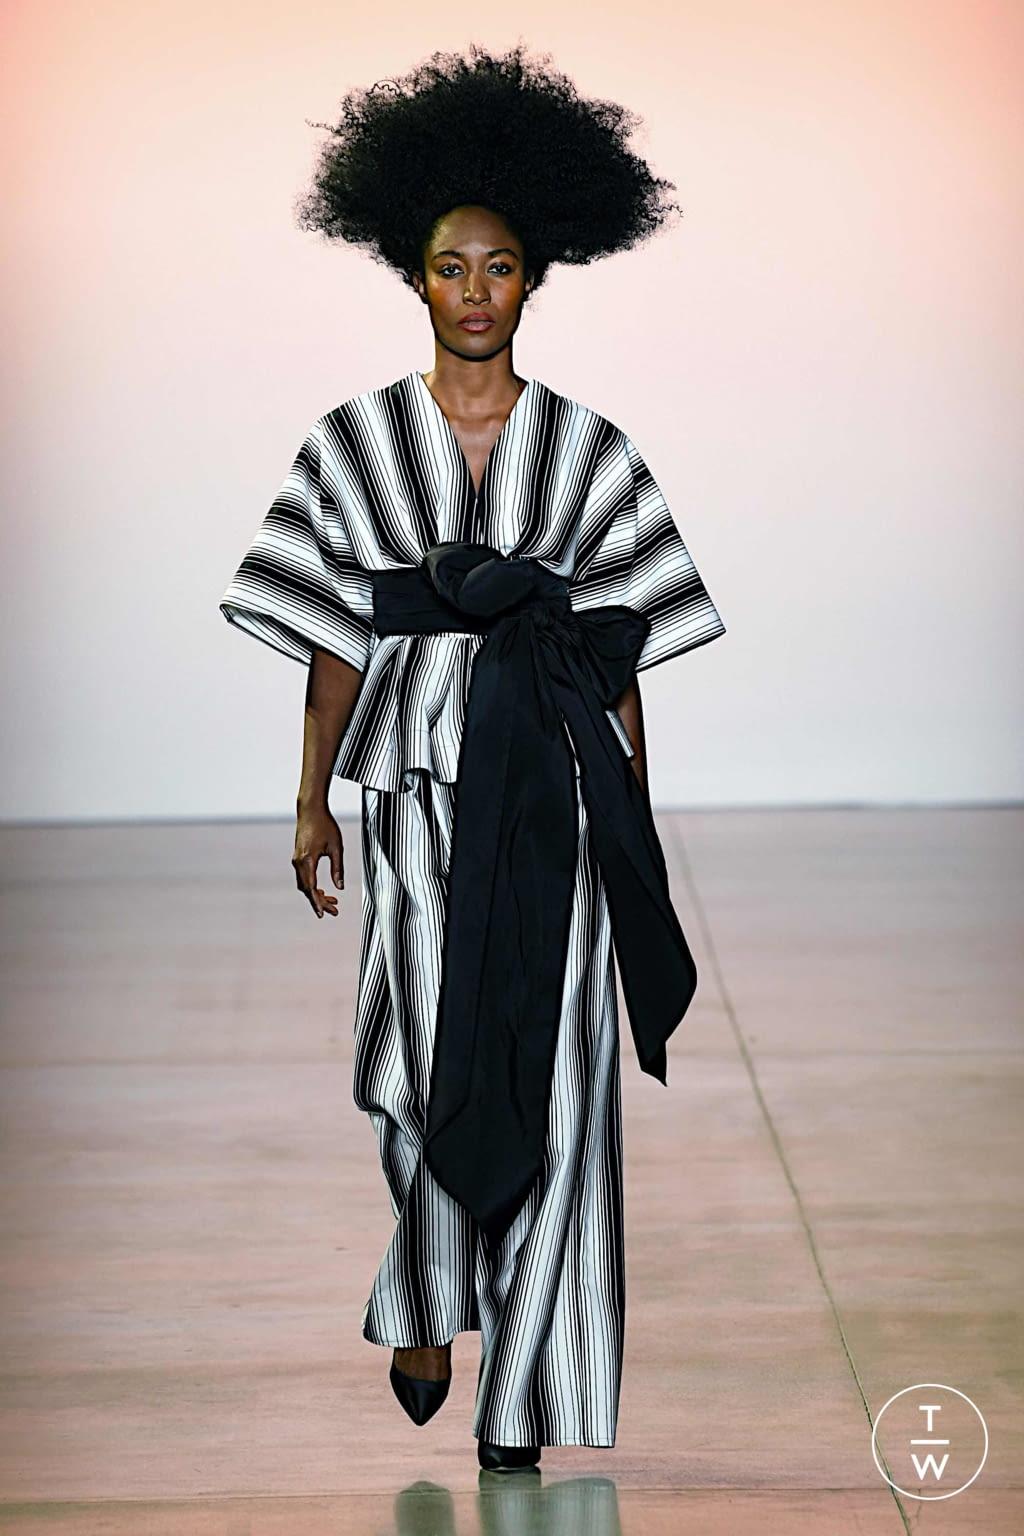 Fashion Week New York Spring/Summer 2020 look 13 de la collection Christopher John Rogers womenswear